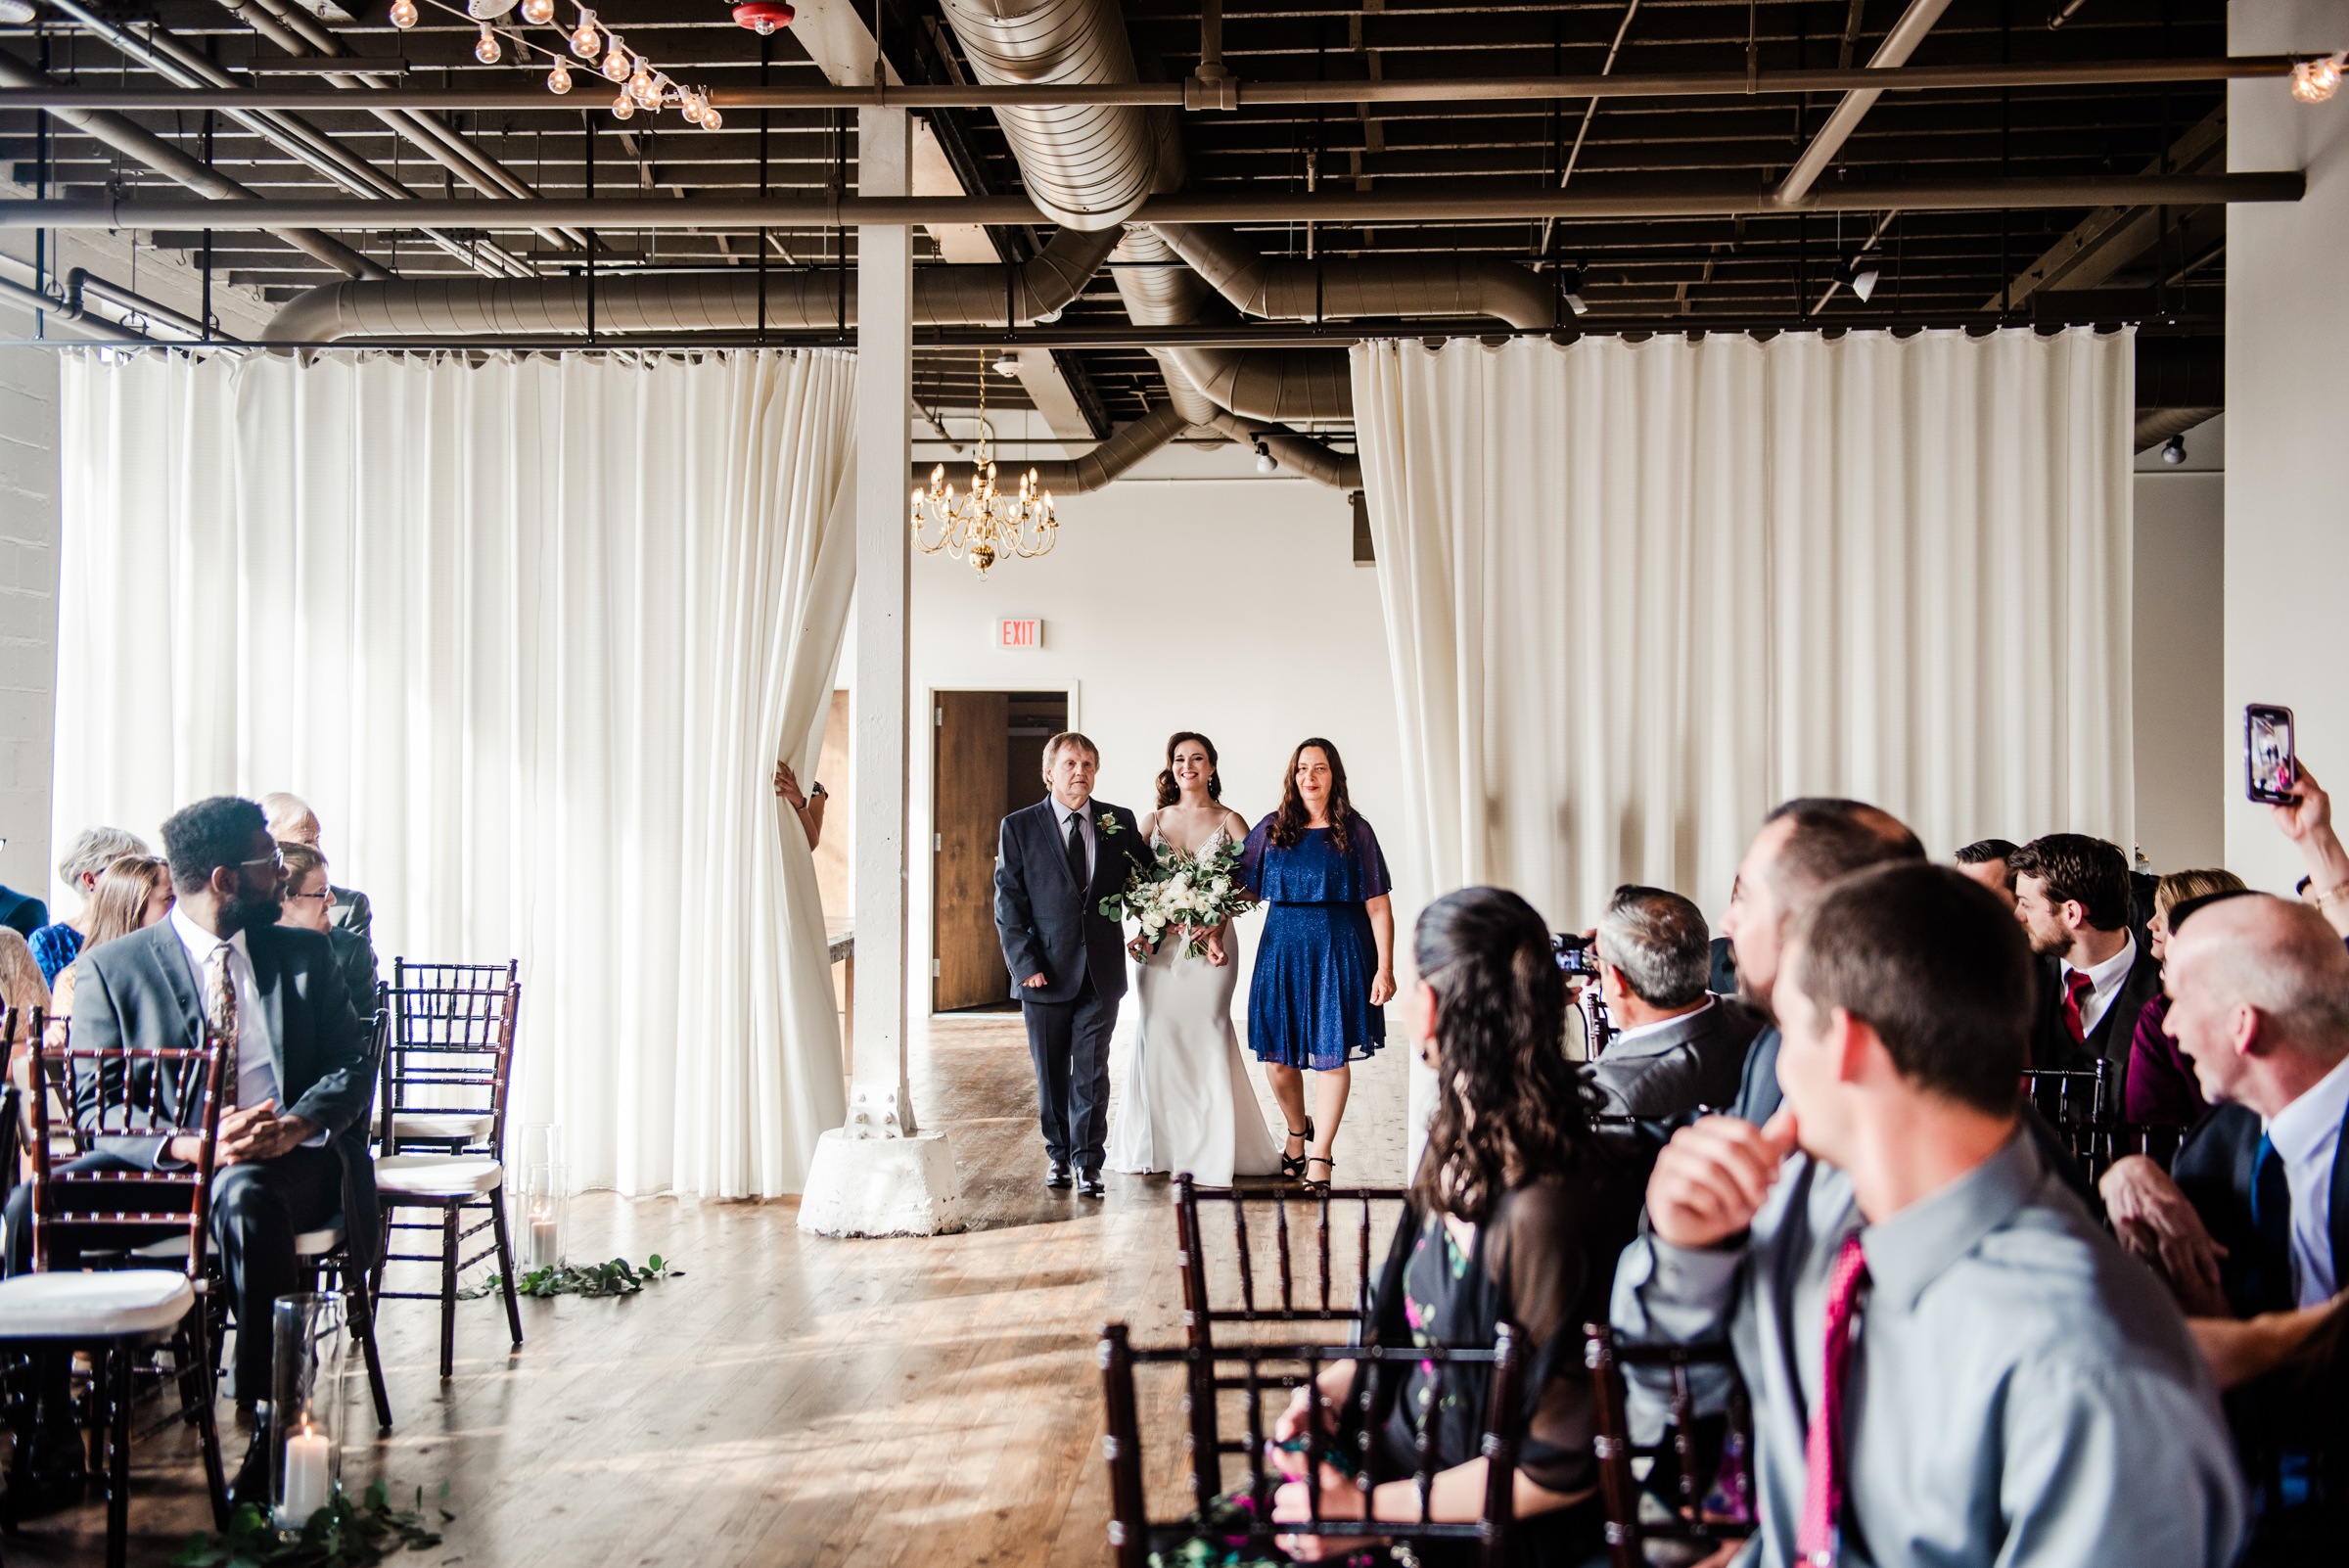 The_Arbor_LoftRochester_Wedding_JILL_STUDIO_Rochester_NY_Photographer_170439.jpg